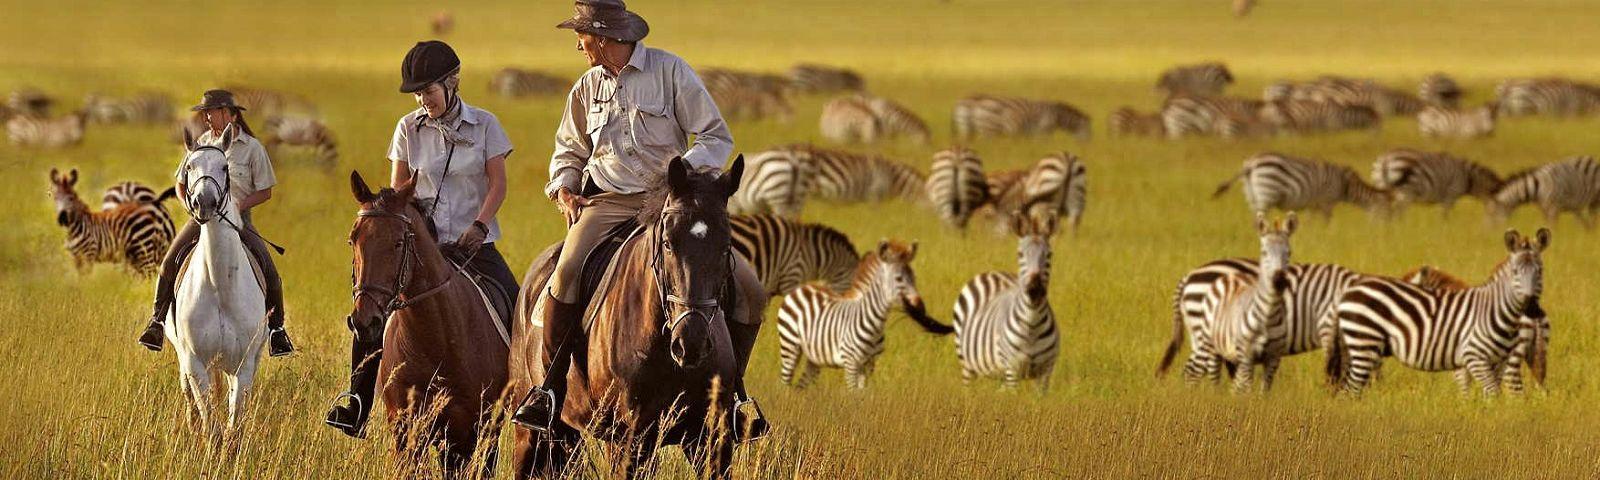 African serengeti-national-park-zebras